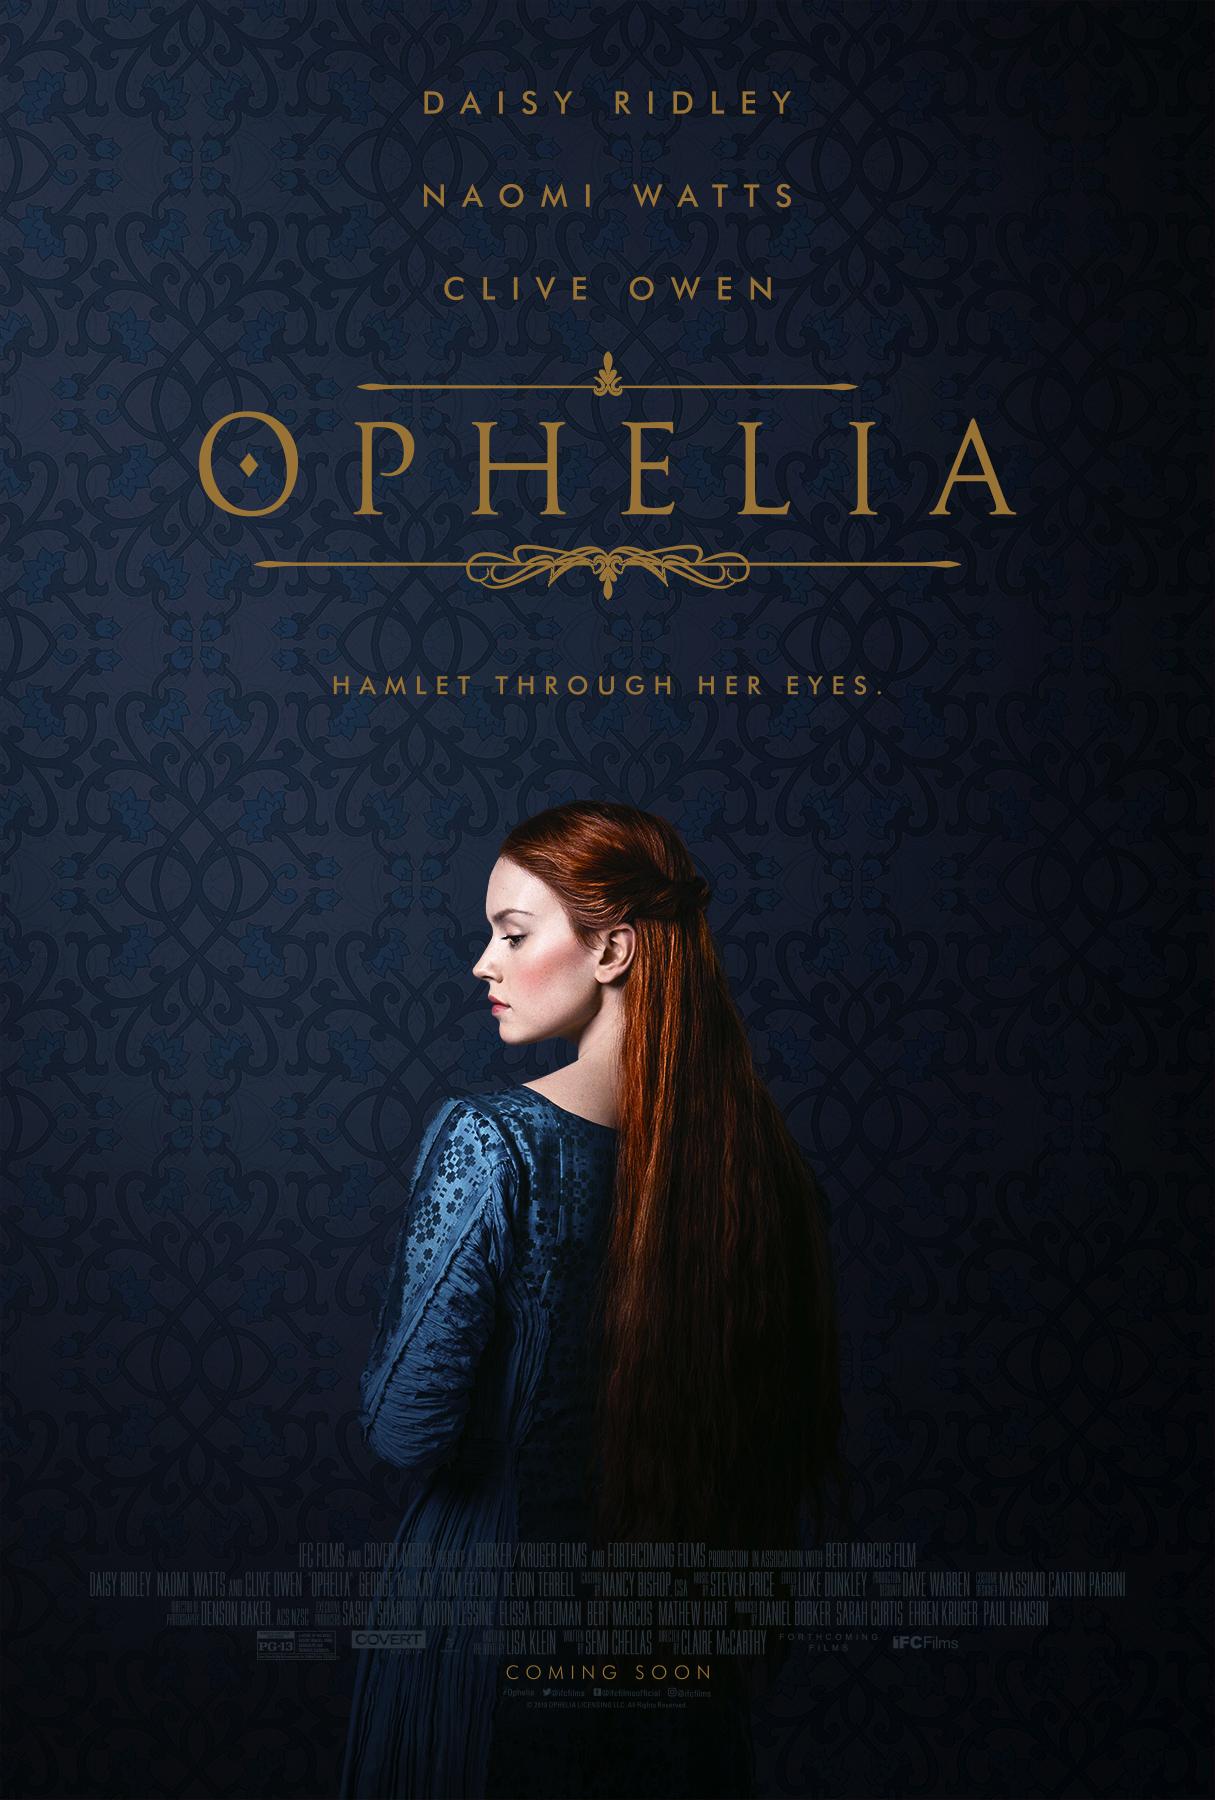 Movies @ Middletown: Ophelia